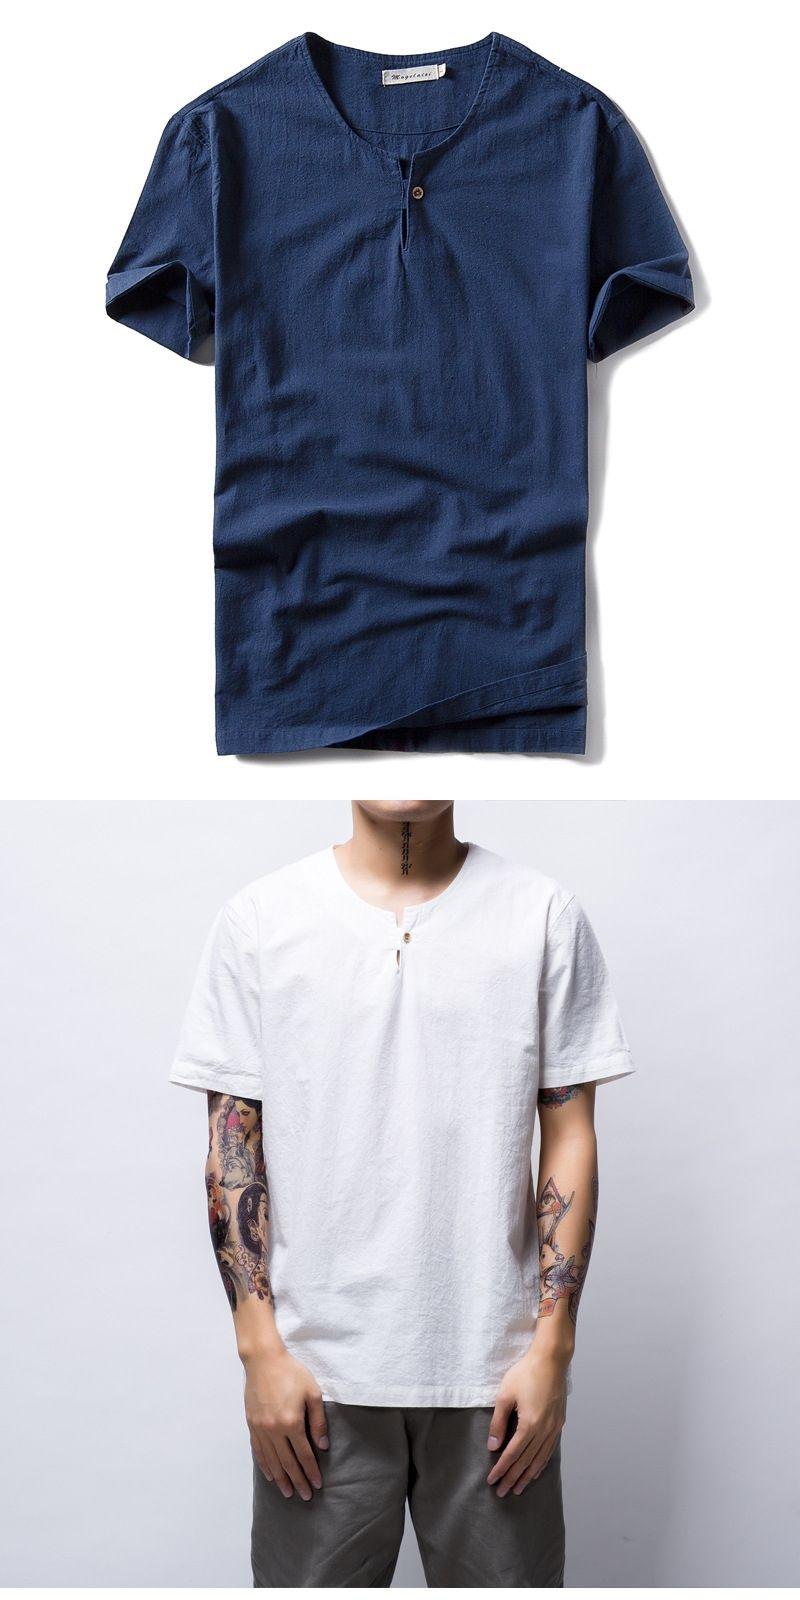 Italy Style Cotton Linen T Shirt Men Summer Casual Men T Shirt Straight O